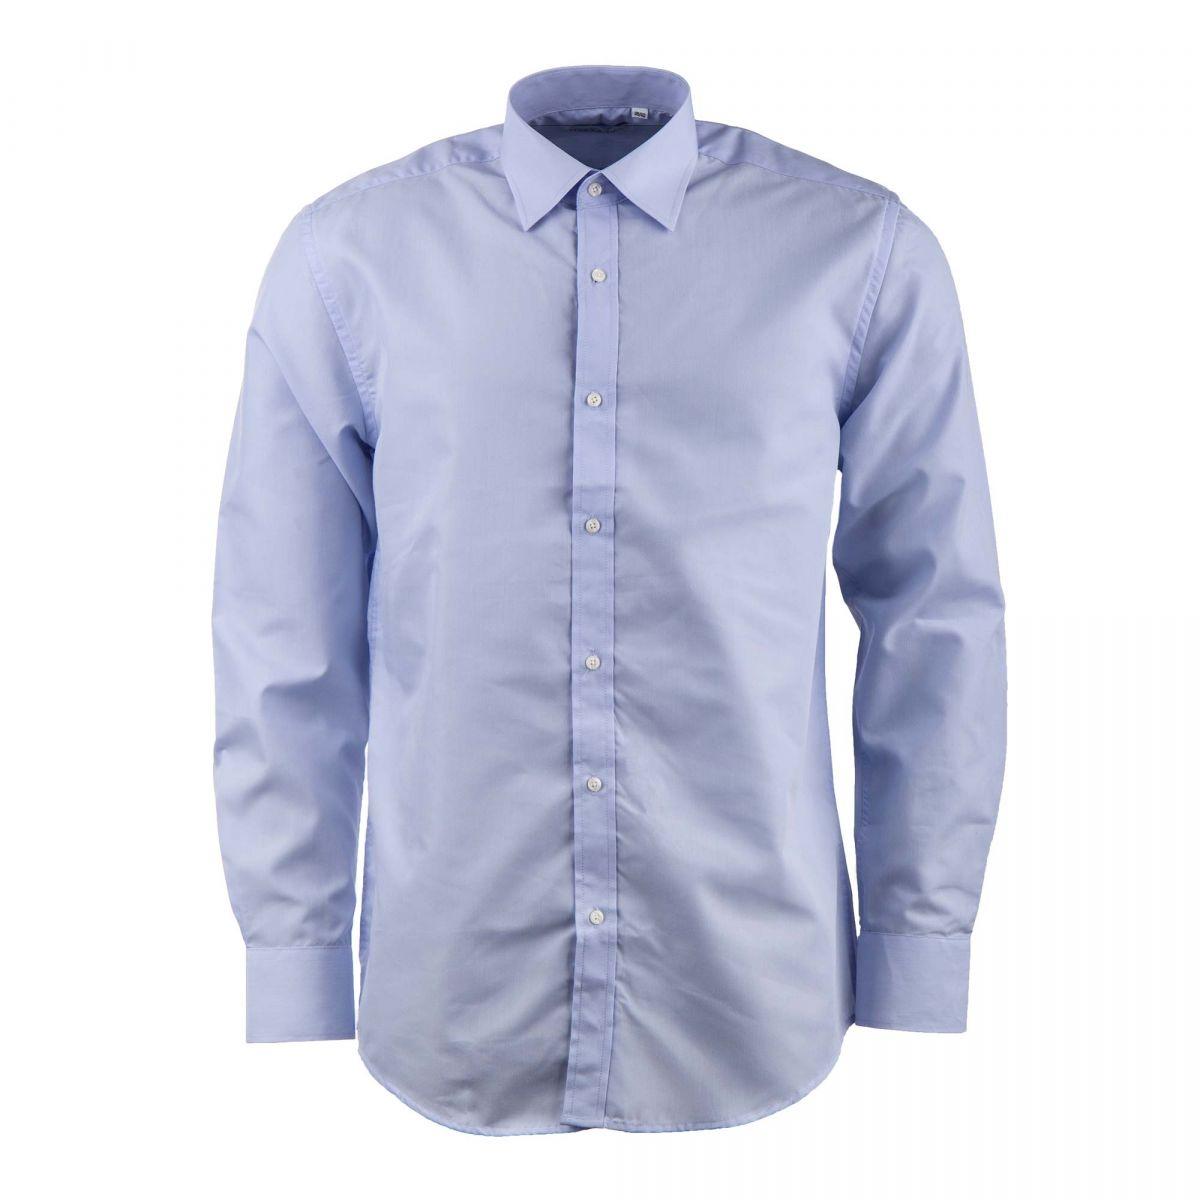 chemise-droite-unie-homme-cedric-manoukian.jpg 22e5e06dbd8